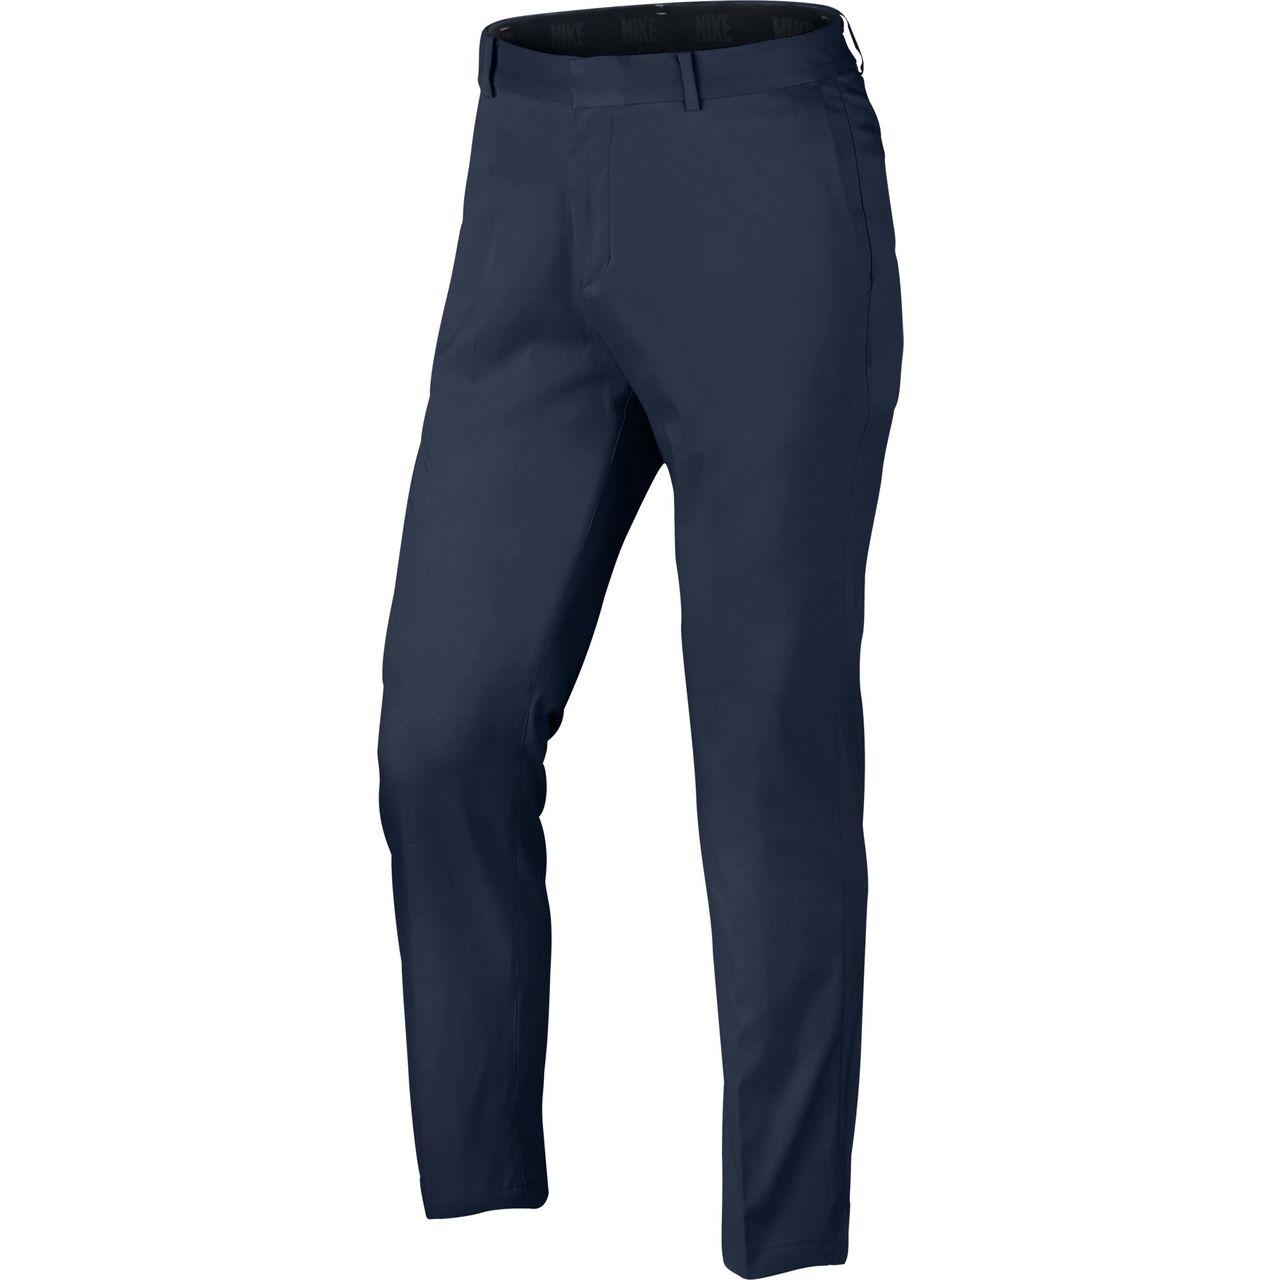 1ac2bbced6f2 Nike New Flat Front Men s Golf Pants - Navy